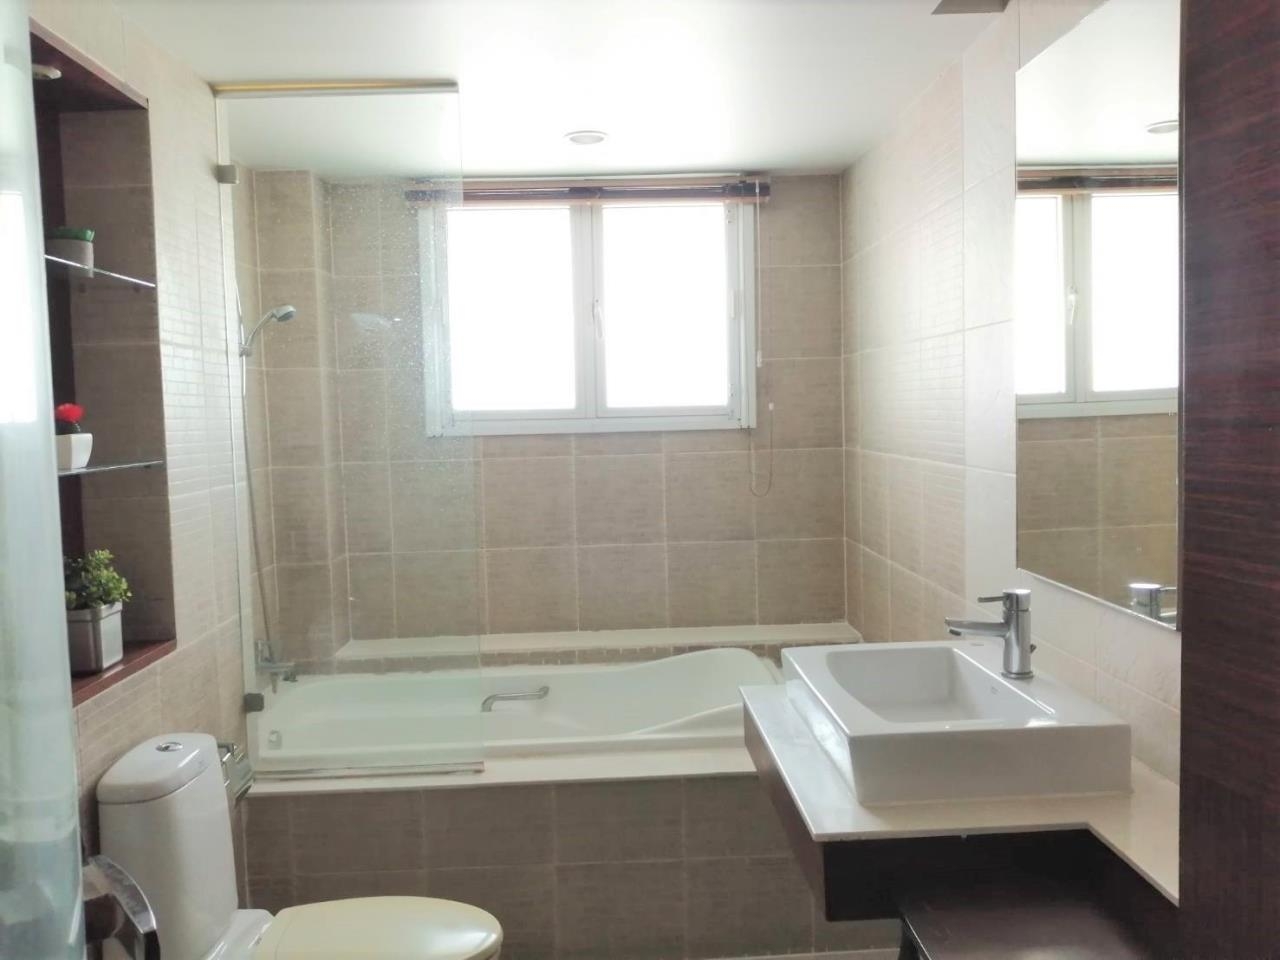 Blueocean property Agency's Condo For Rent – Avenue 61 Condominium 12